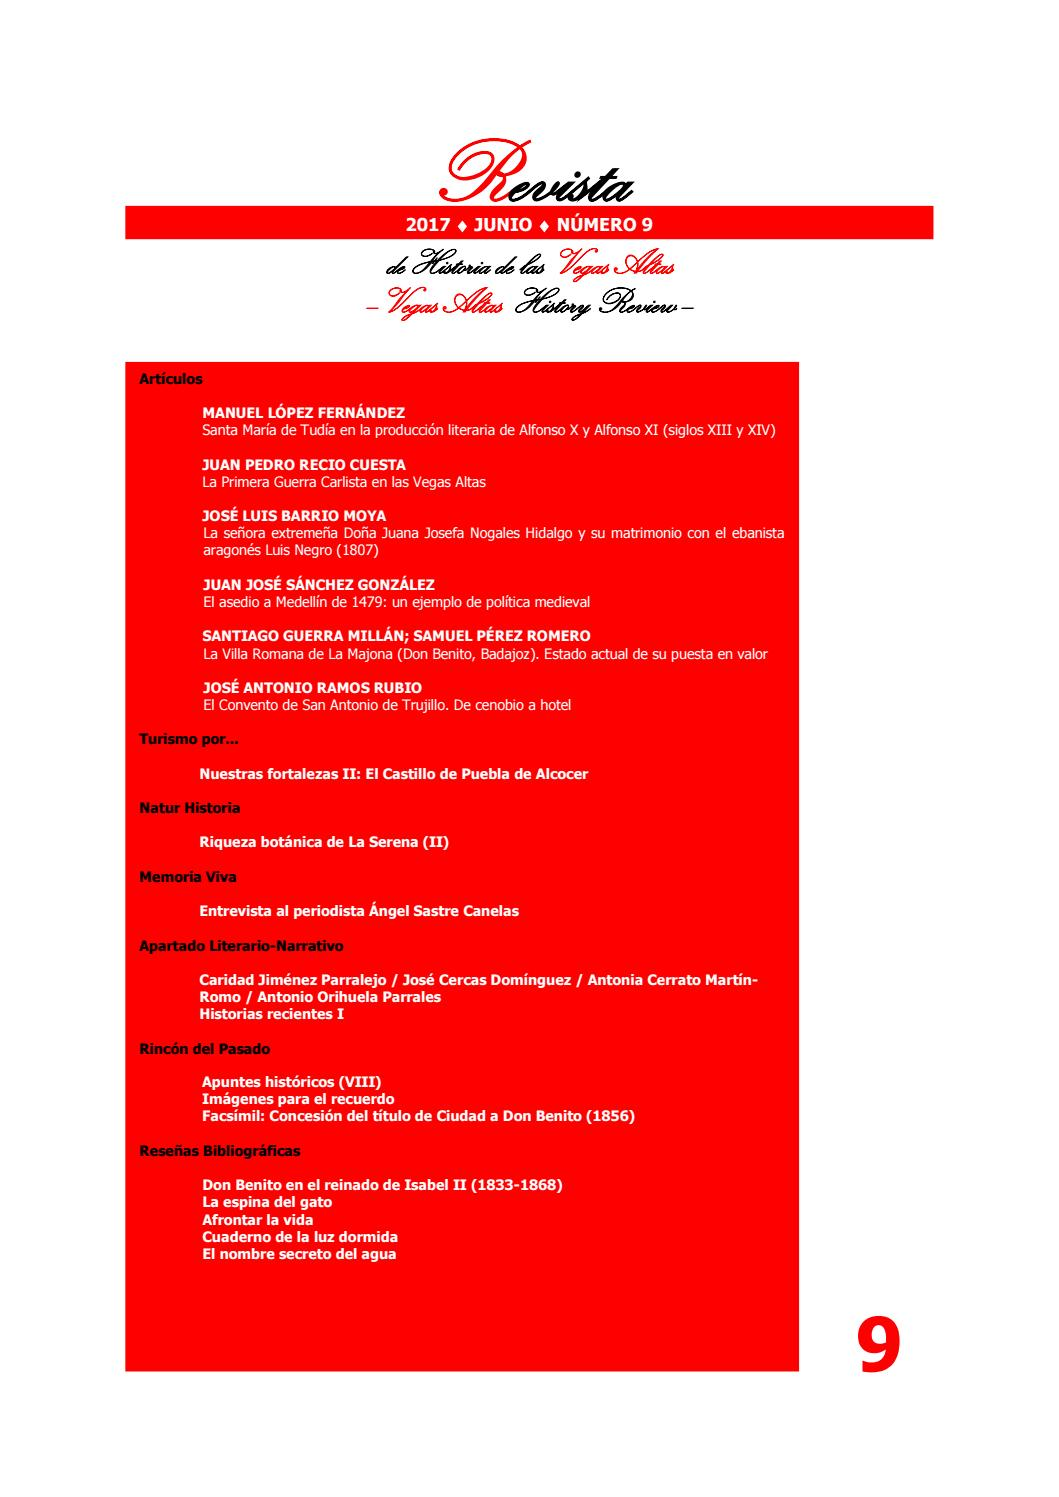 Revista De Historia De Las Vegas Altas Vegas Altas History  # Muebles Mogollon Medina Sidonia